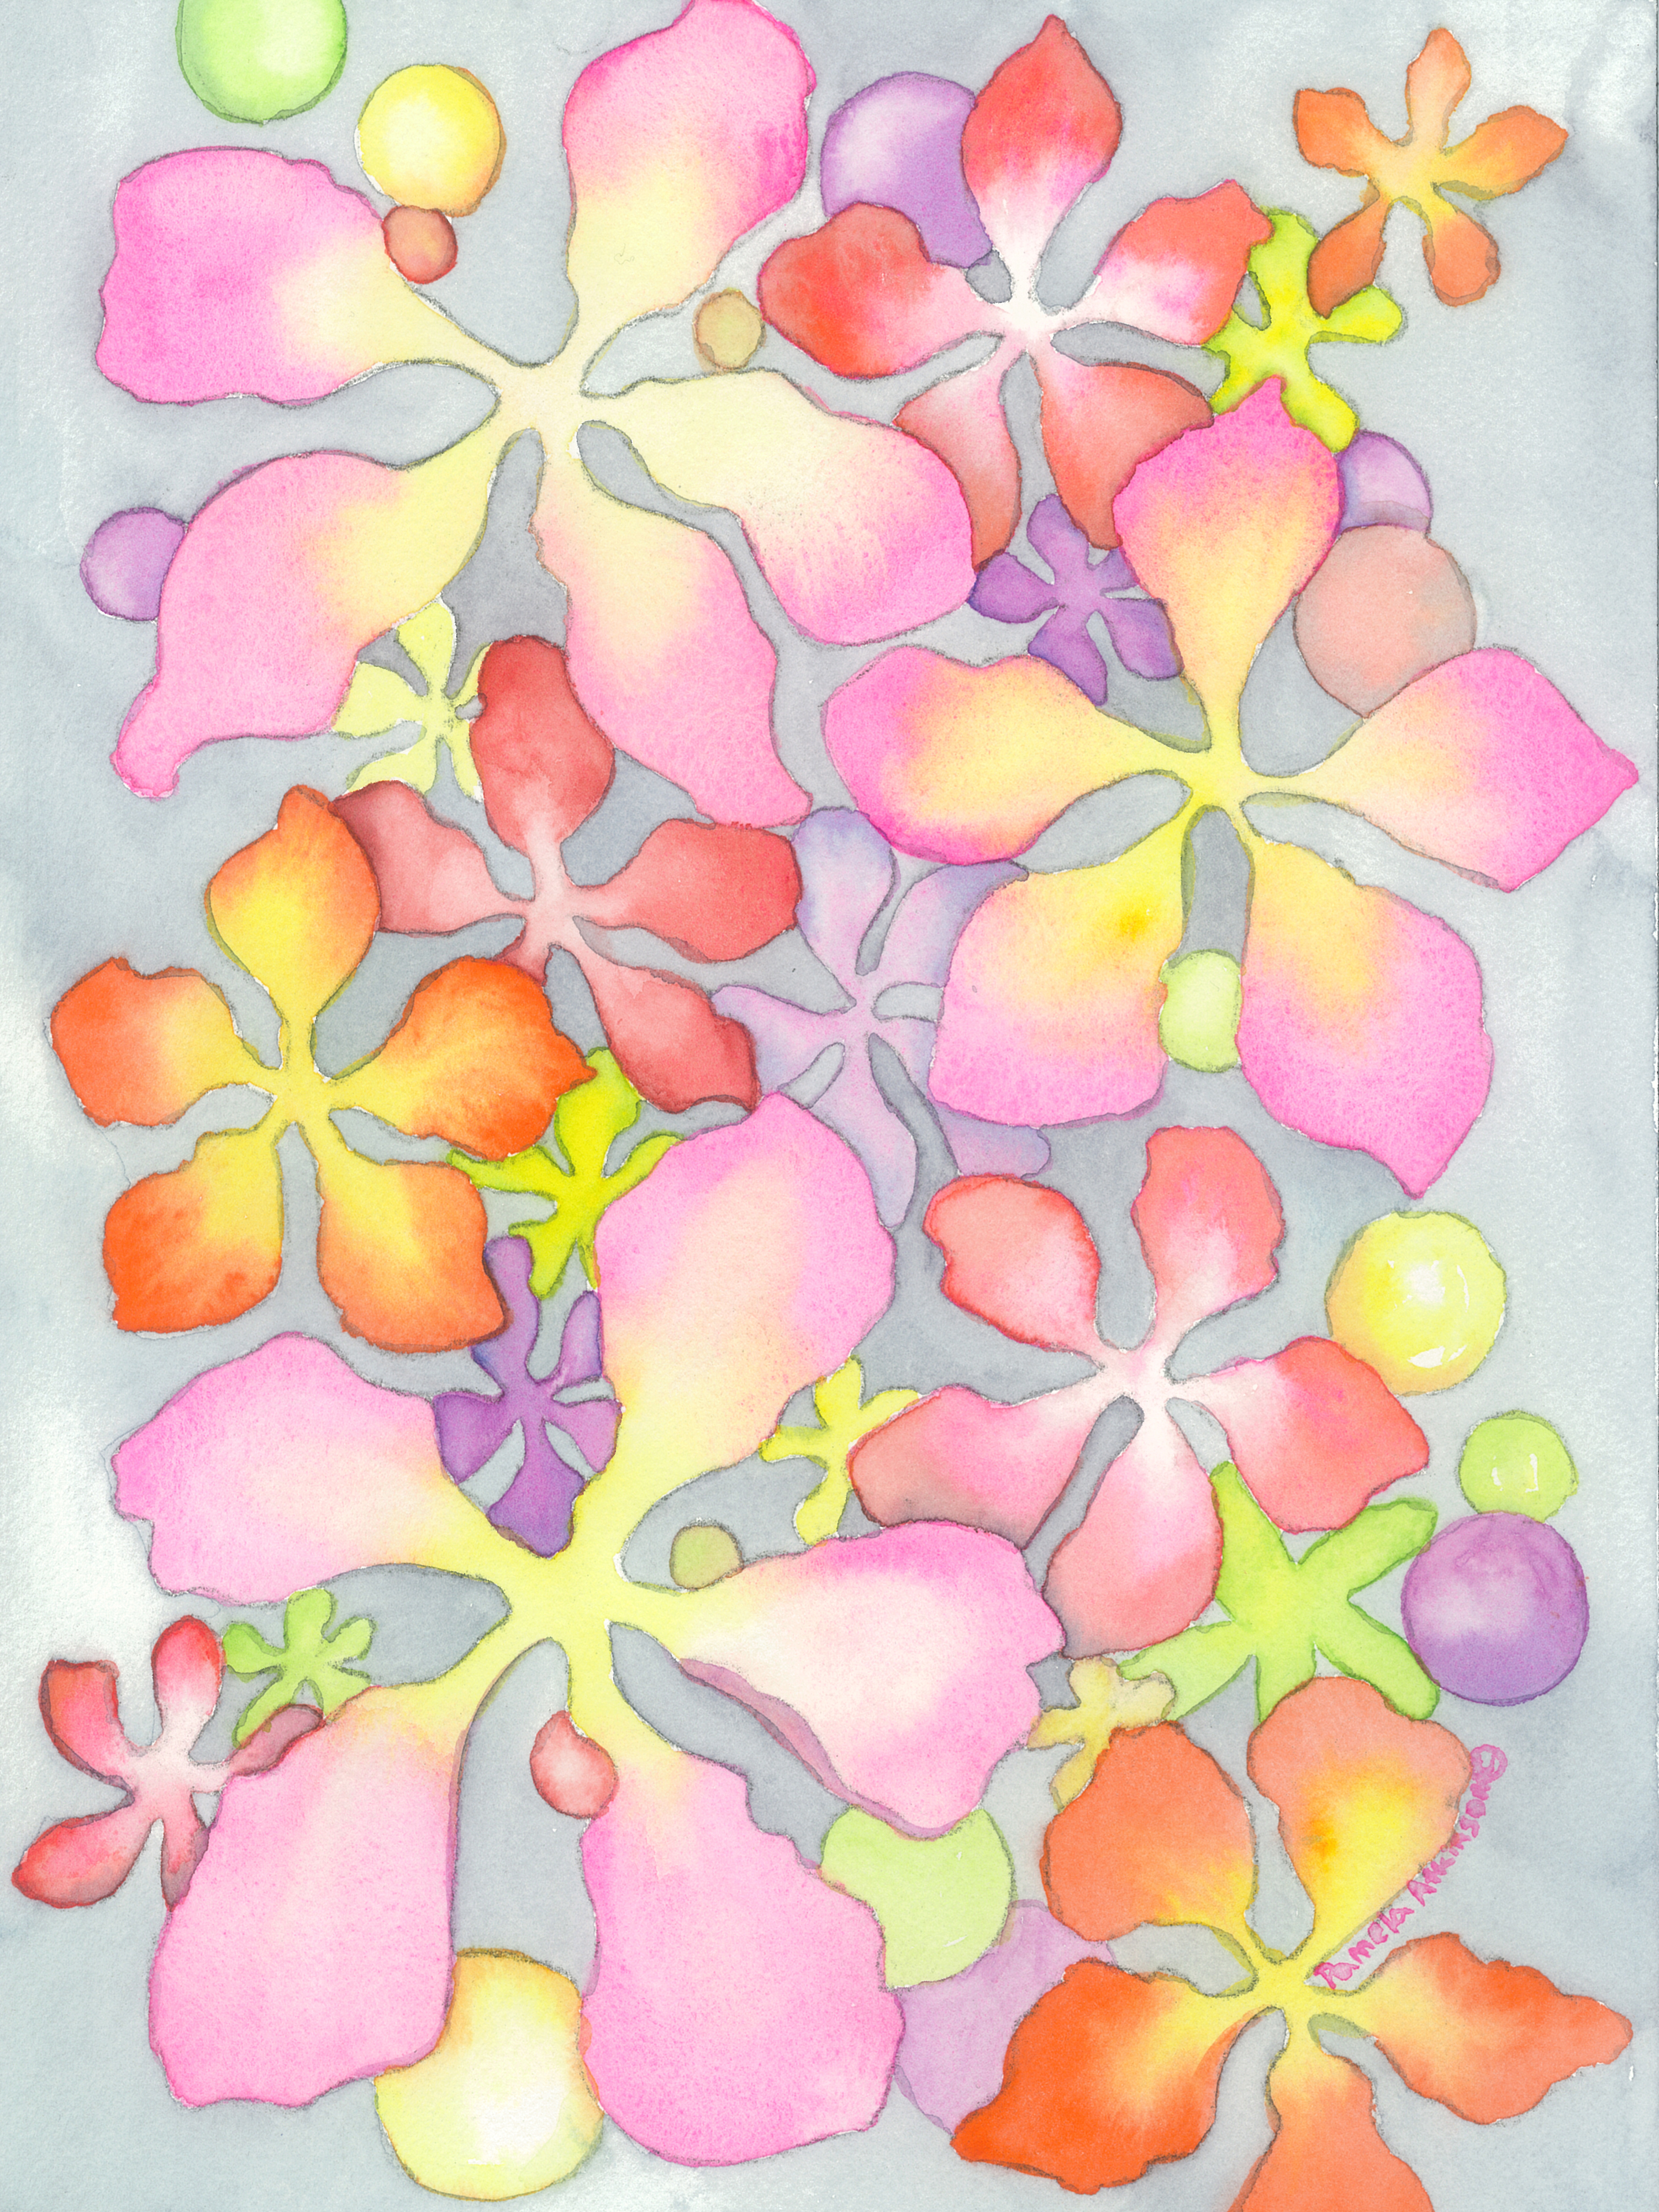 Watercolor, Moon Moss #4,©2018, Pamela Atkinson, Pam Atkinson, pamelaatkinson.net, painting, Energy, Flowers, Beauty, Visual Arts, Southern CA